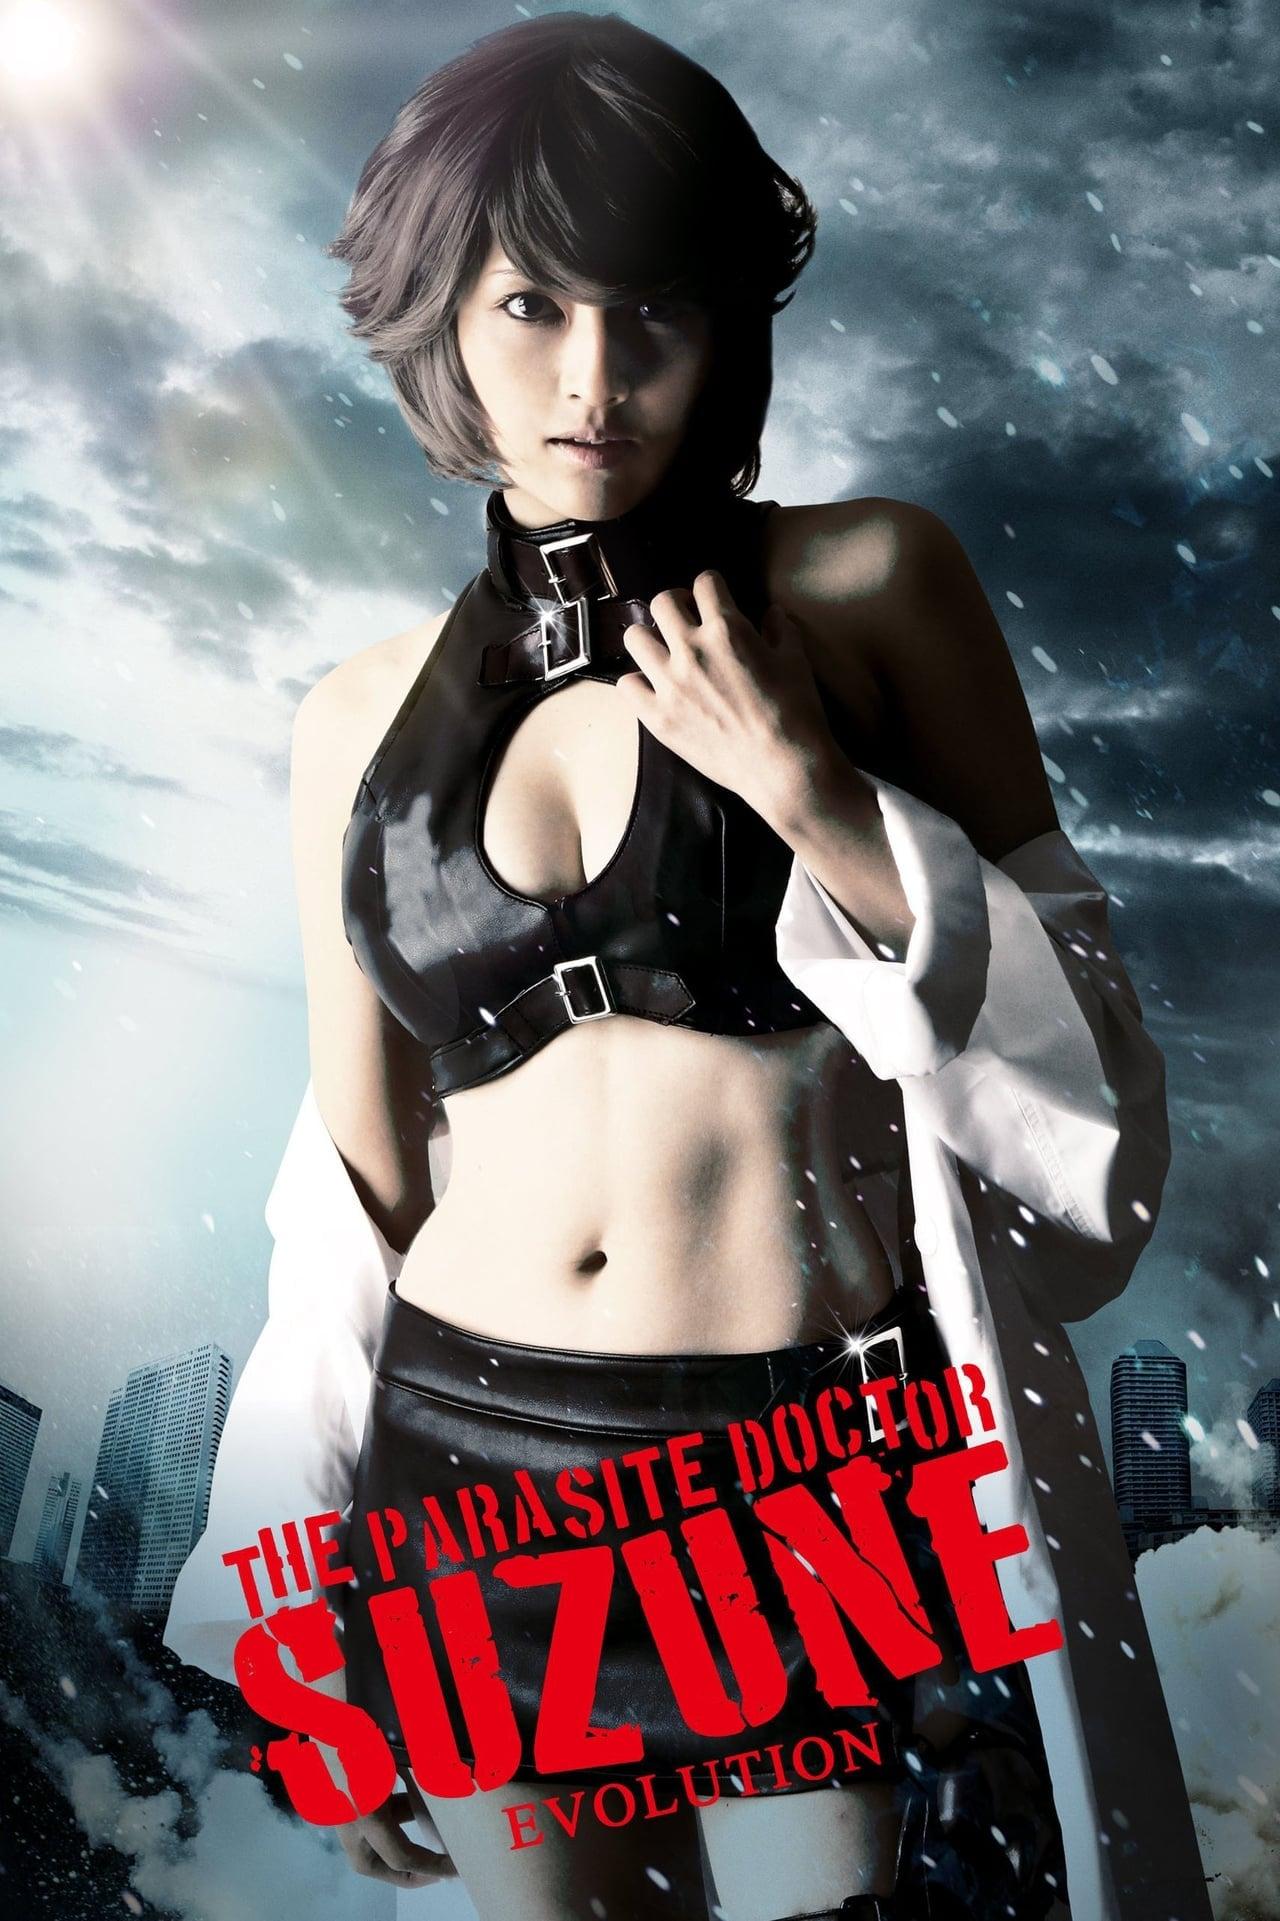 The Parasite Doctor Suzune: Evolution (2011)